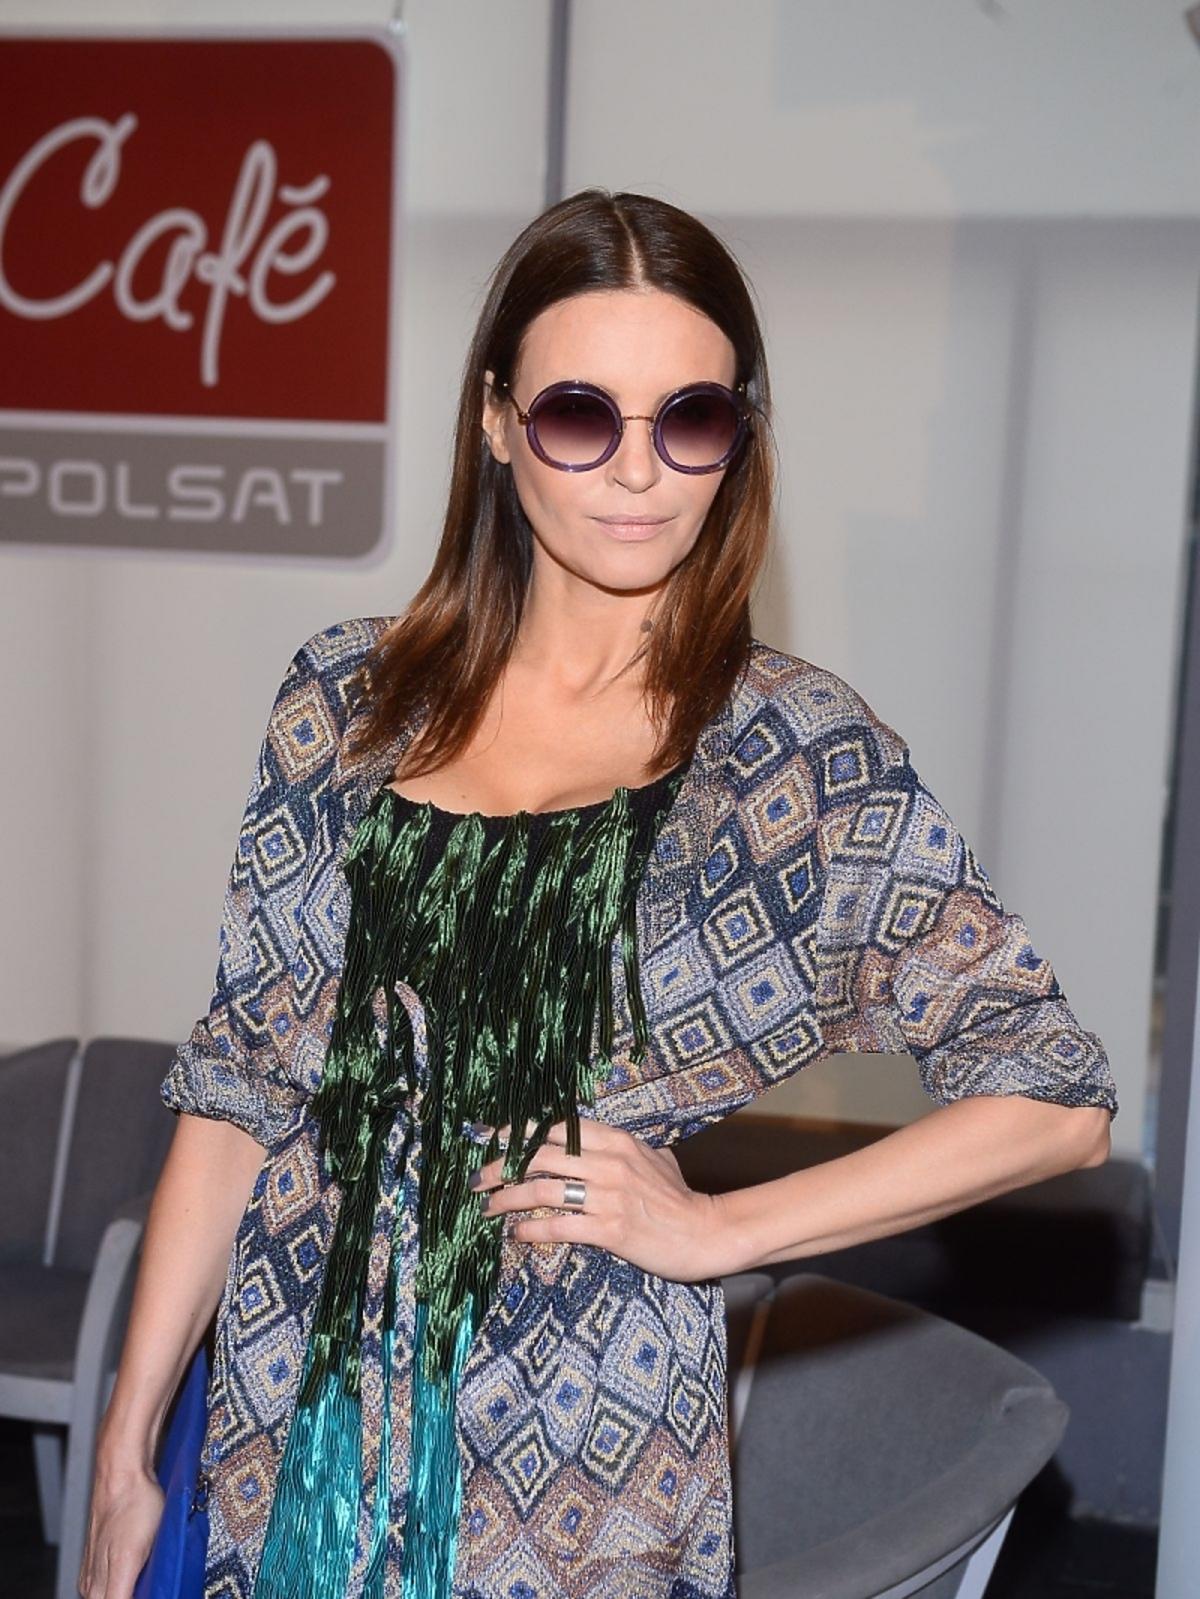 Joanna Horodyńska na prezentacji wiosennej ramówki Polsat Cafe